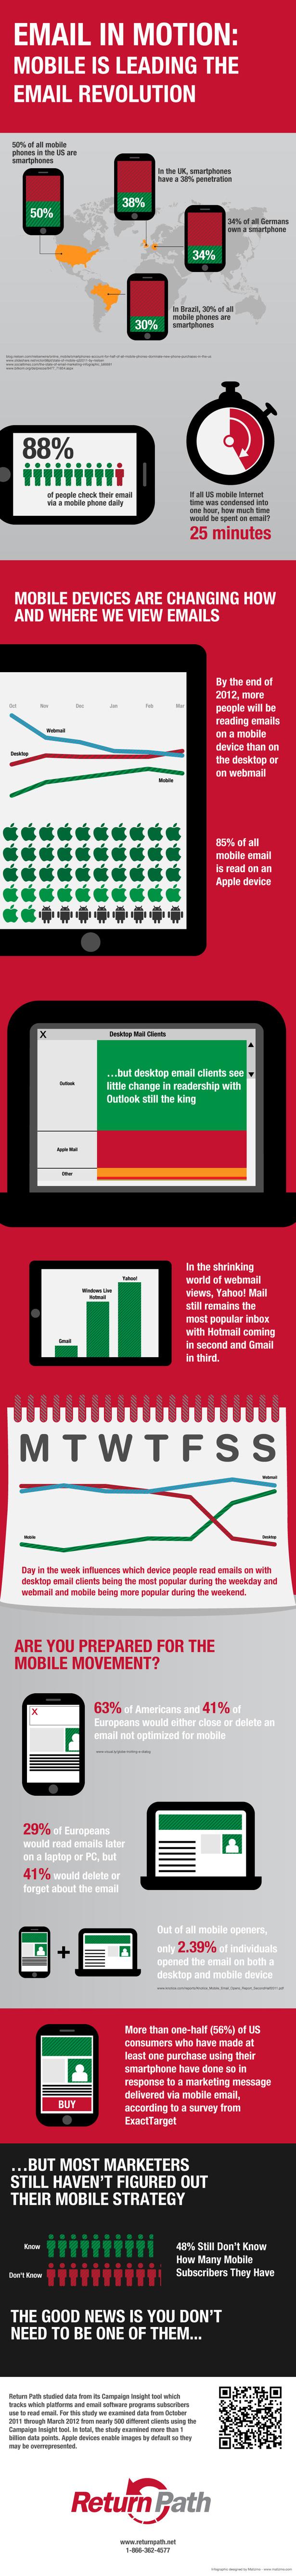 mobile email statistique